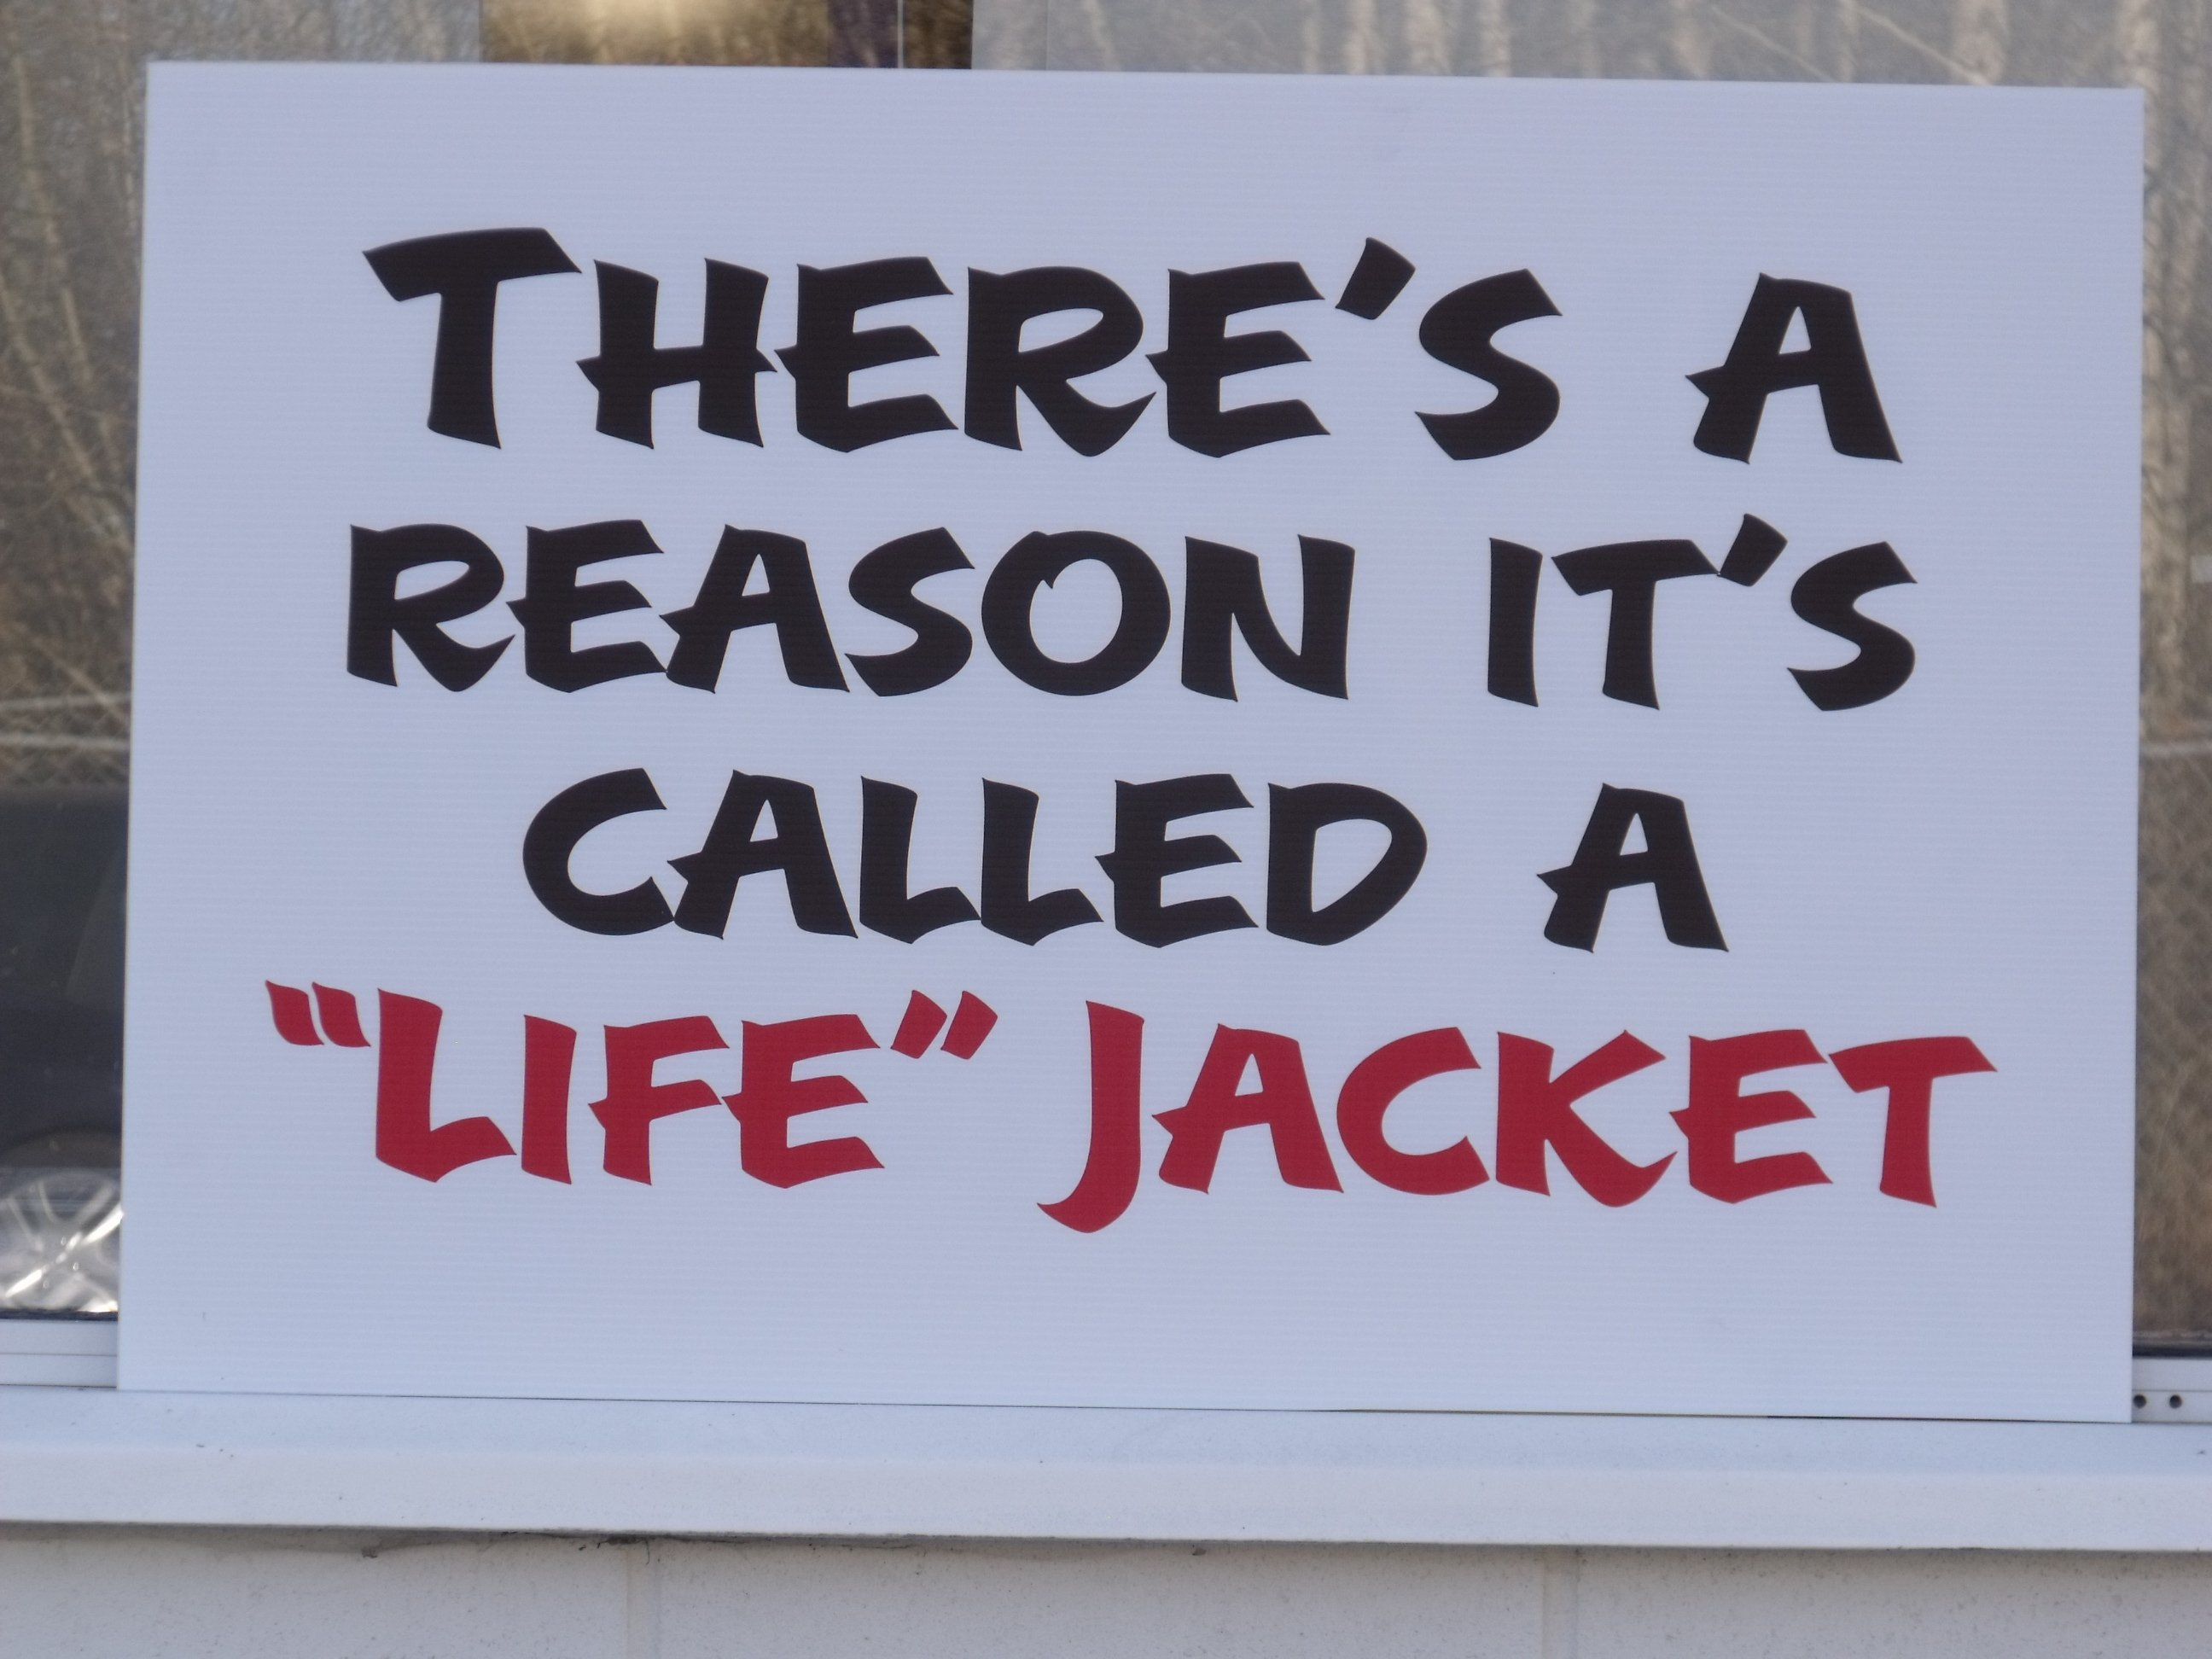 https://0901.nccdn.net/4_2/000/000/079/c81/lifejacket.jpg